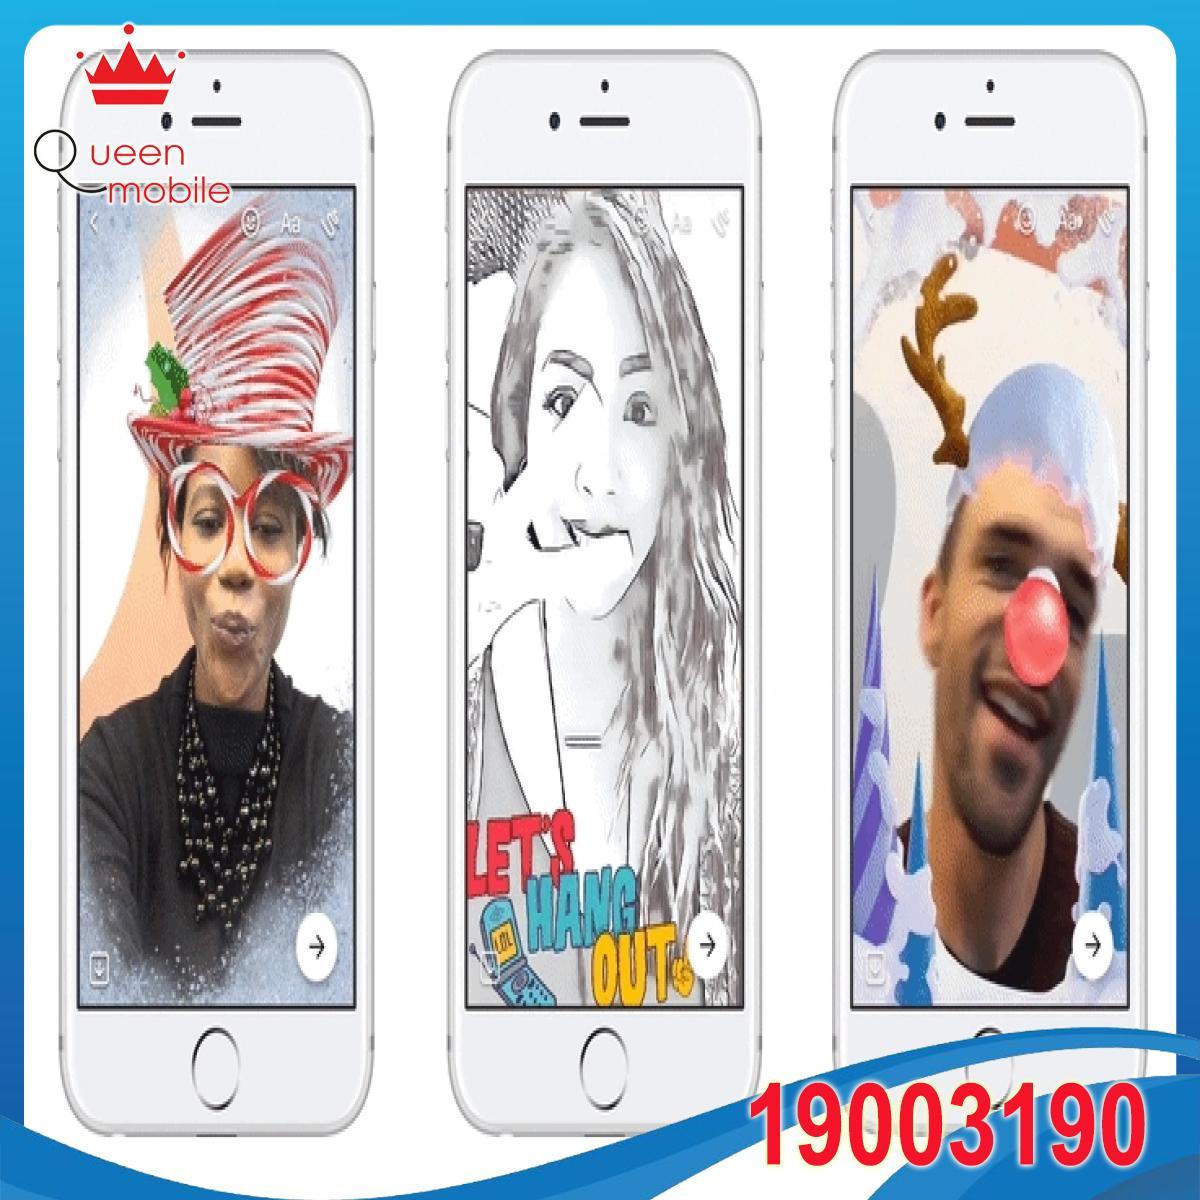 Facebook Messenger bổ sung tính năng Camera tương tự Snapchat